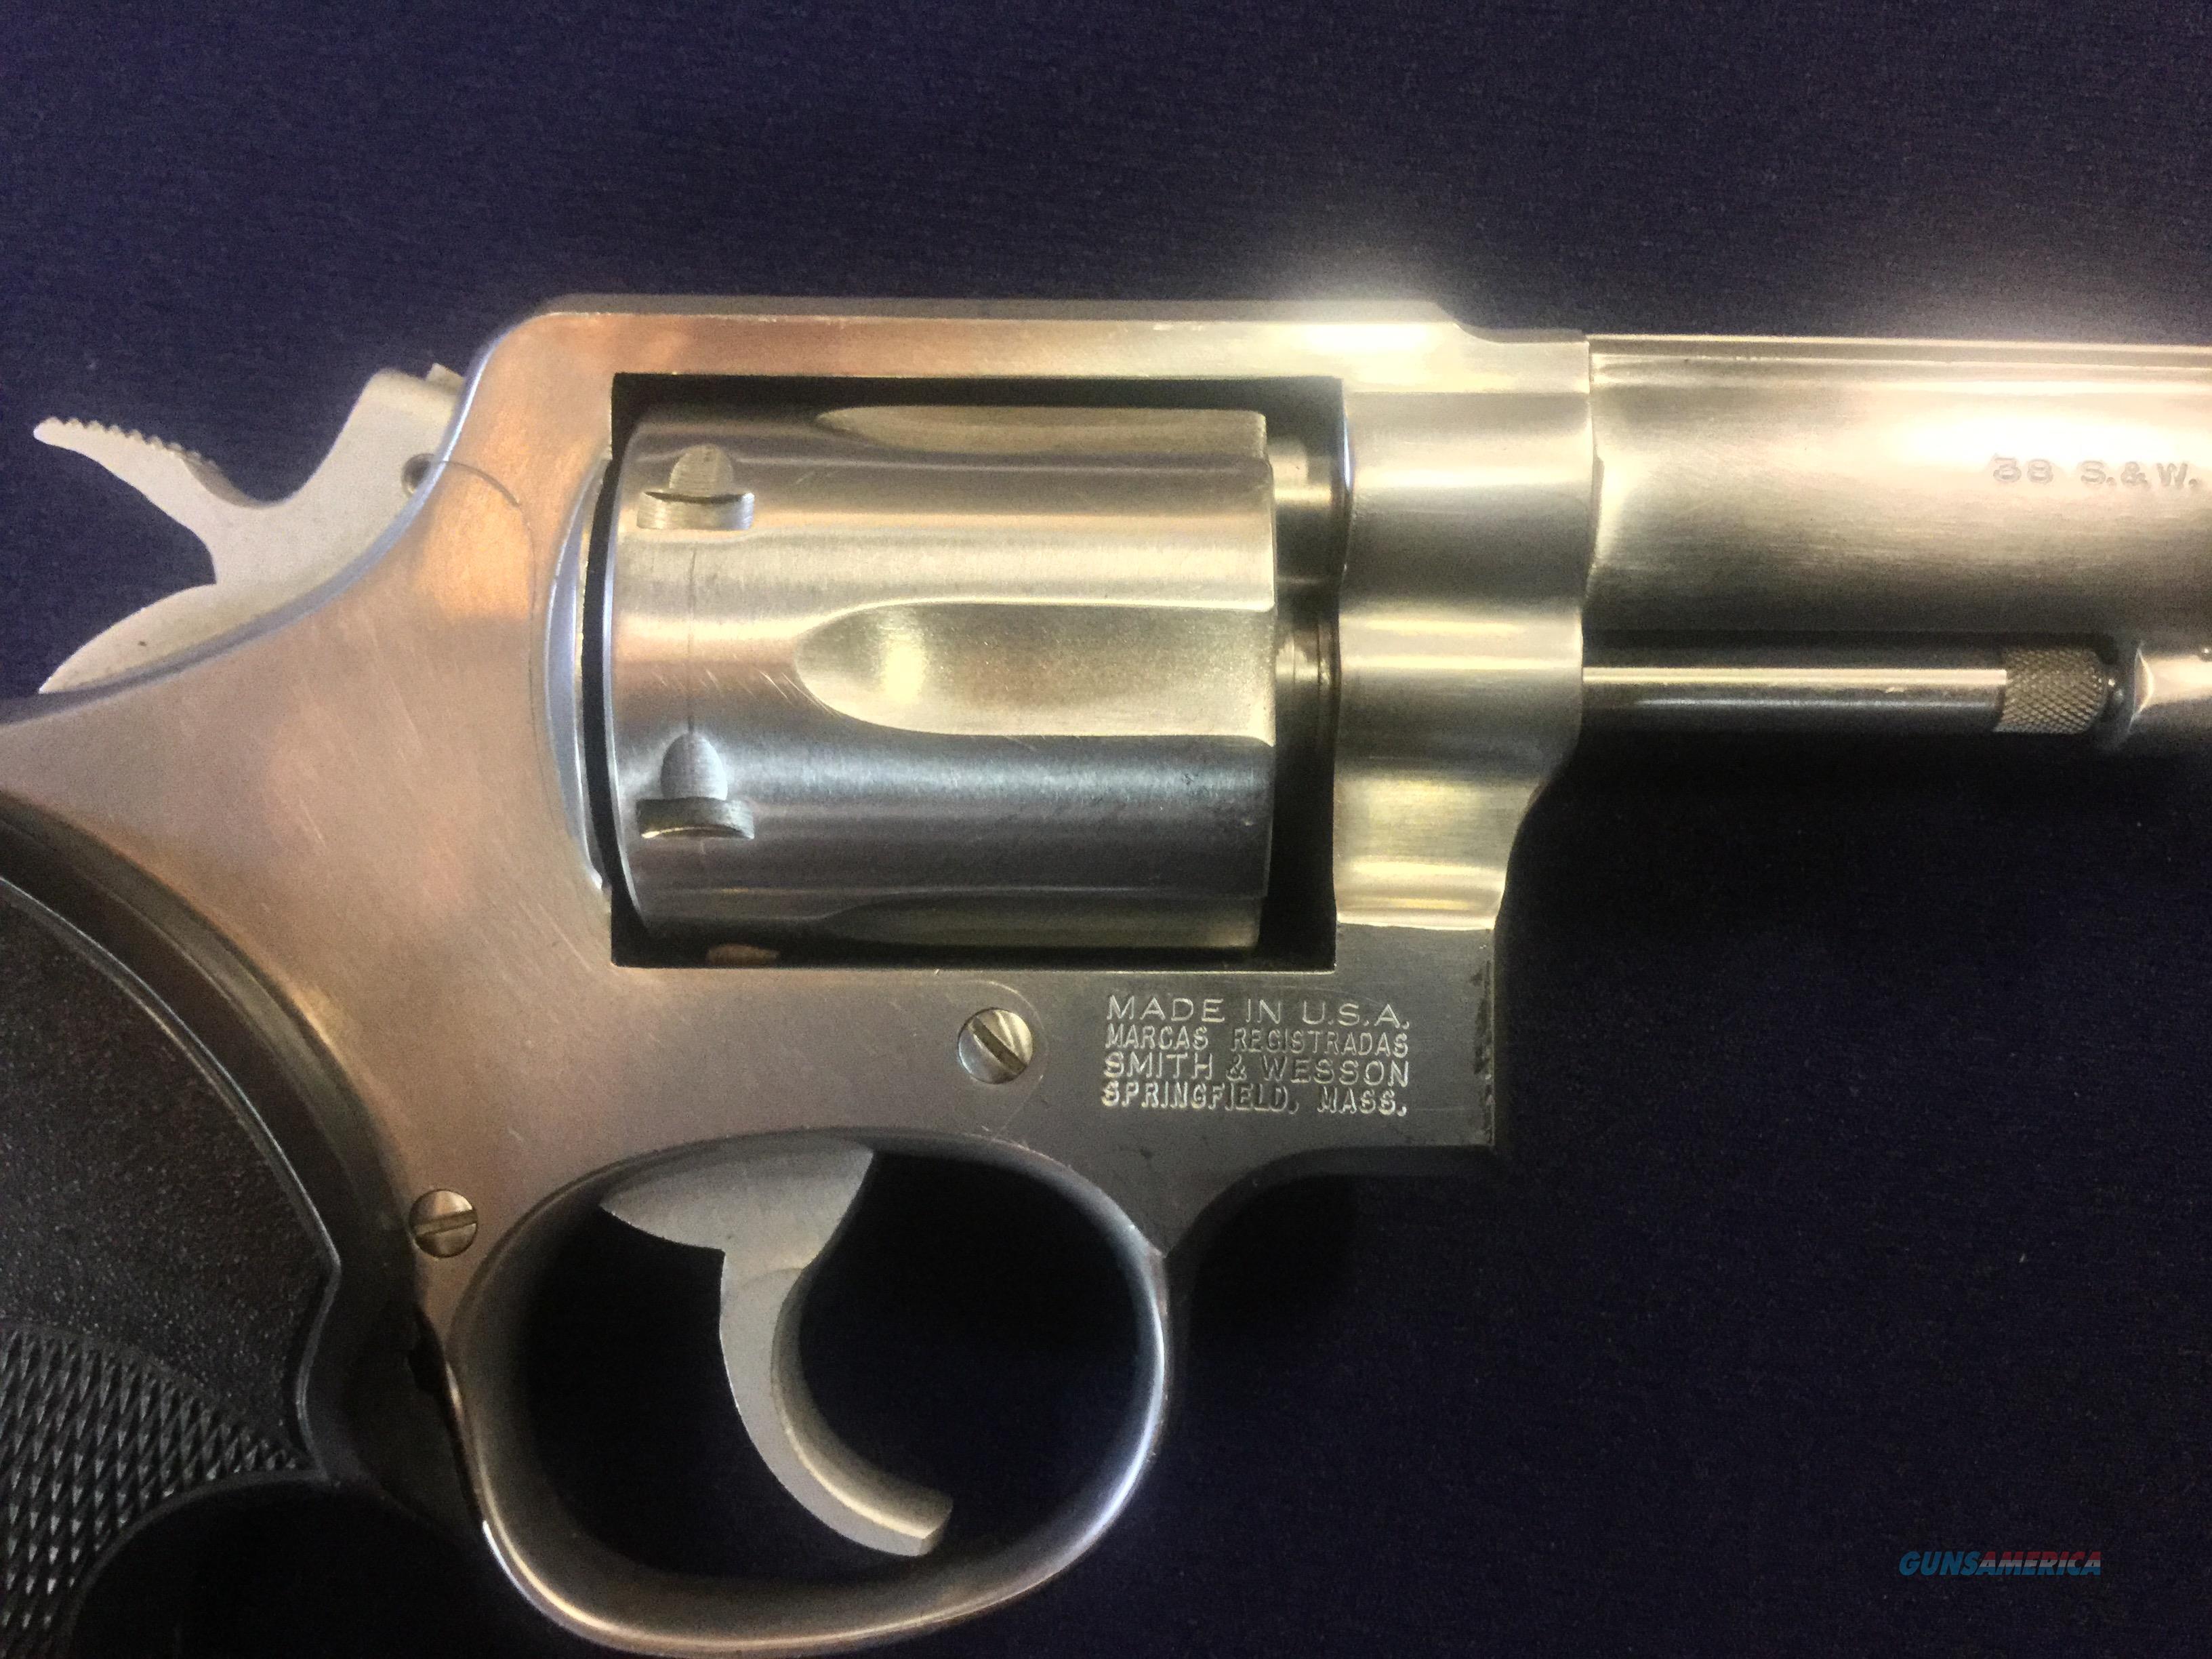 K Frame 357 Magnum Revolver Holster